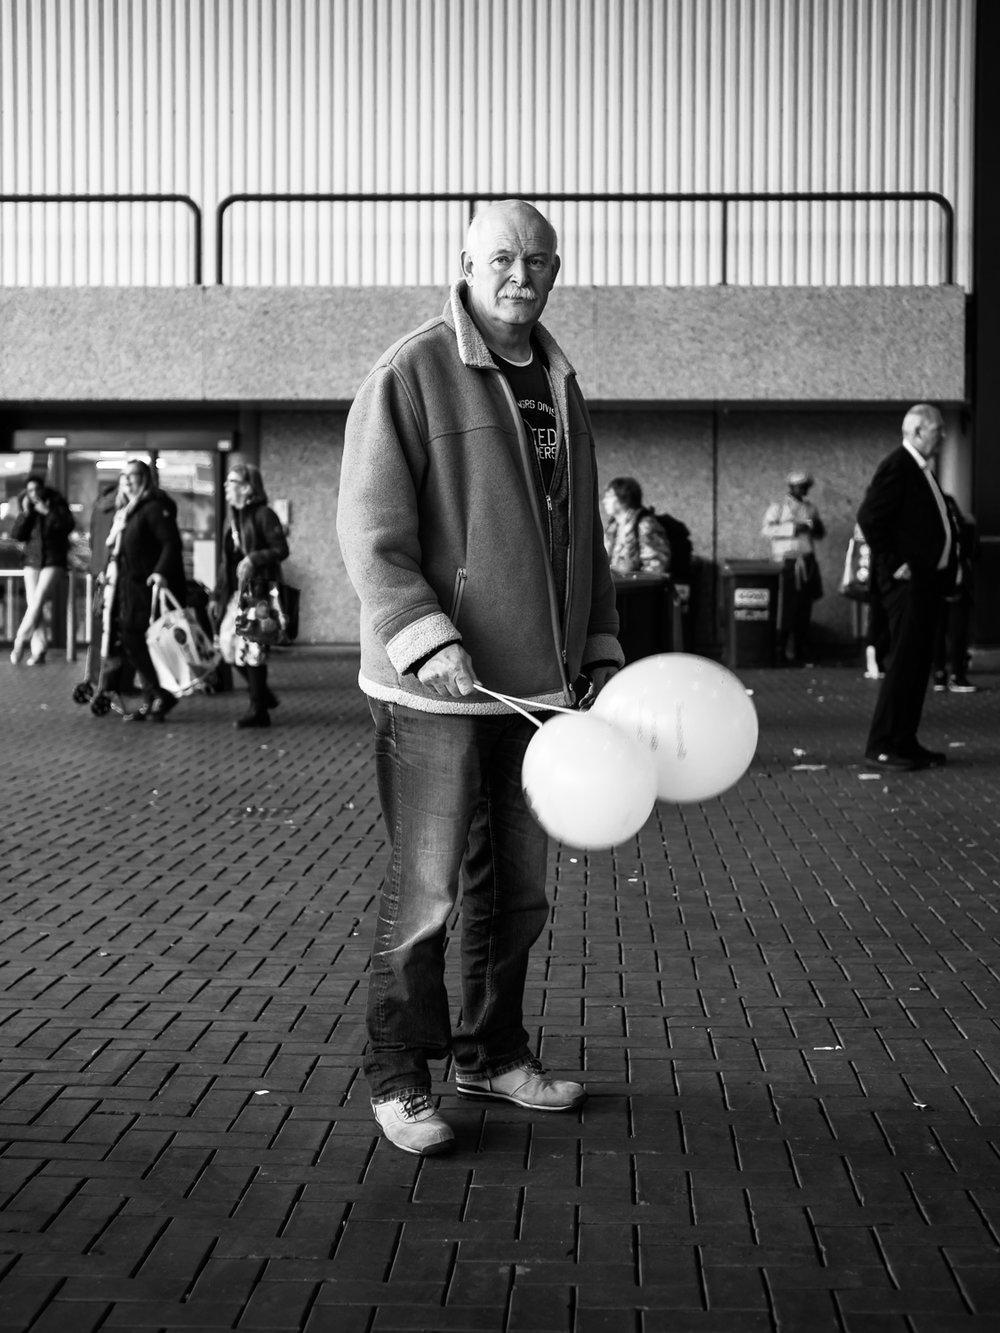 fokko muller street photography - 170225 - 009.jpg